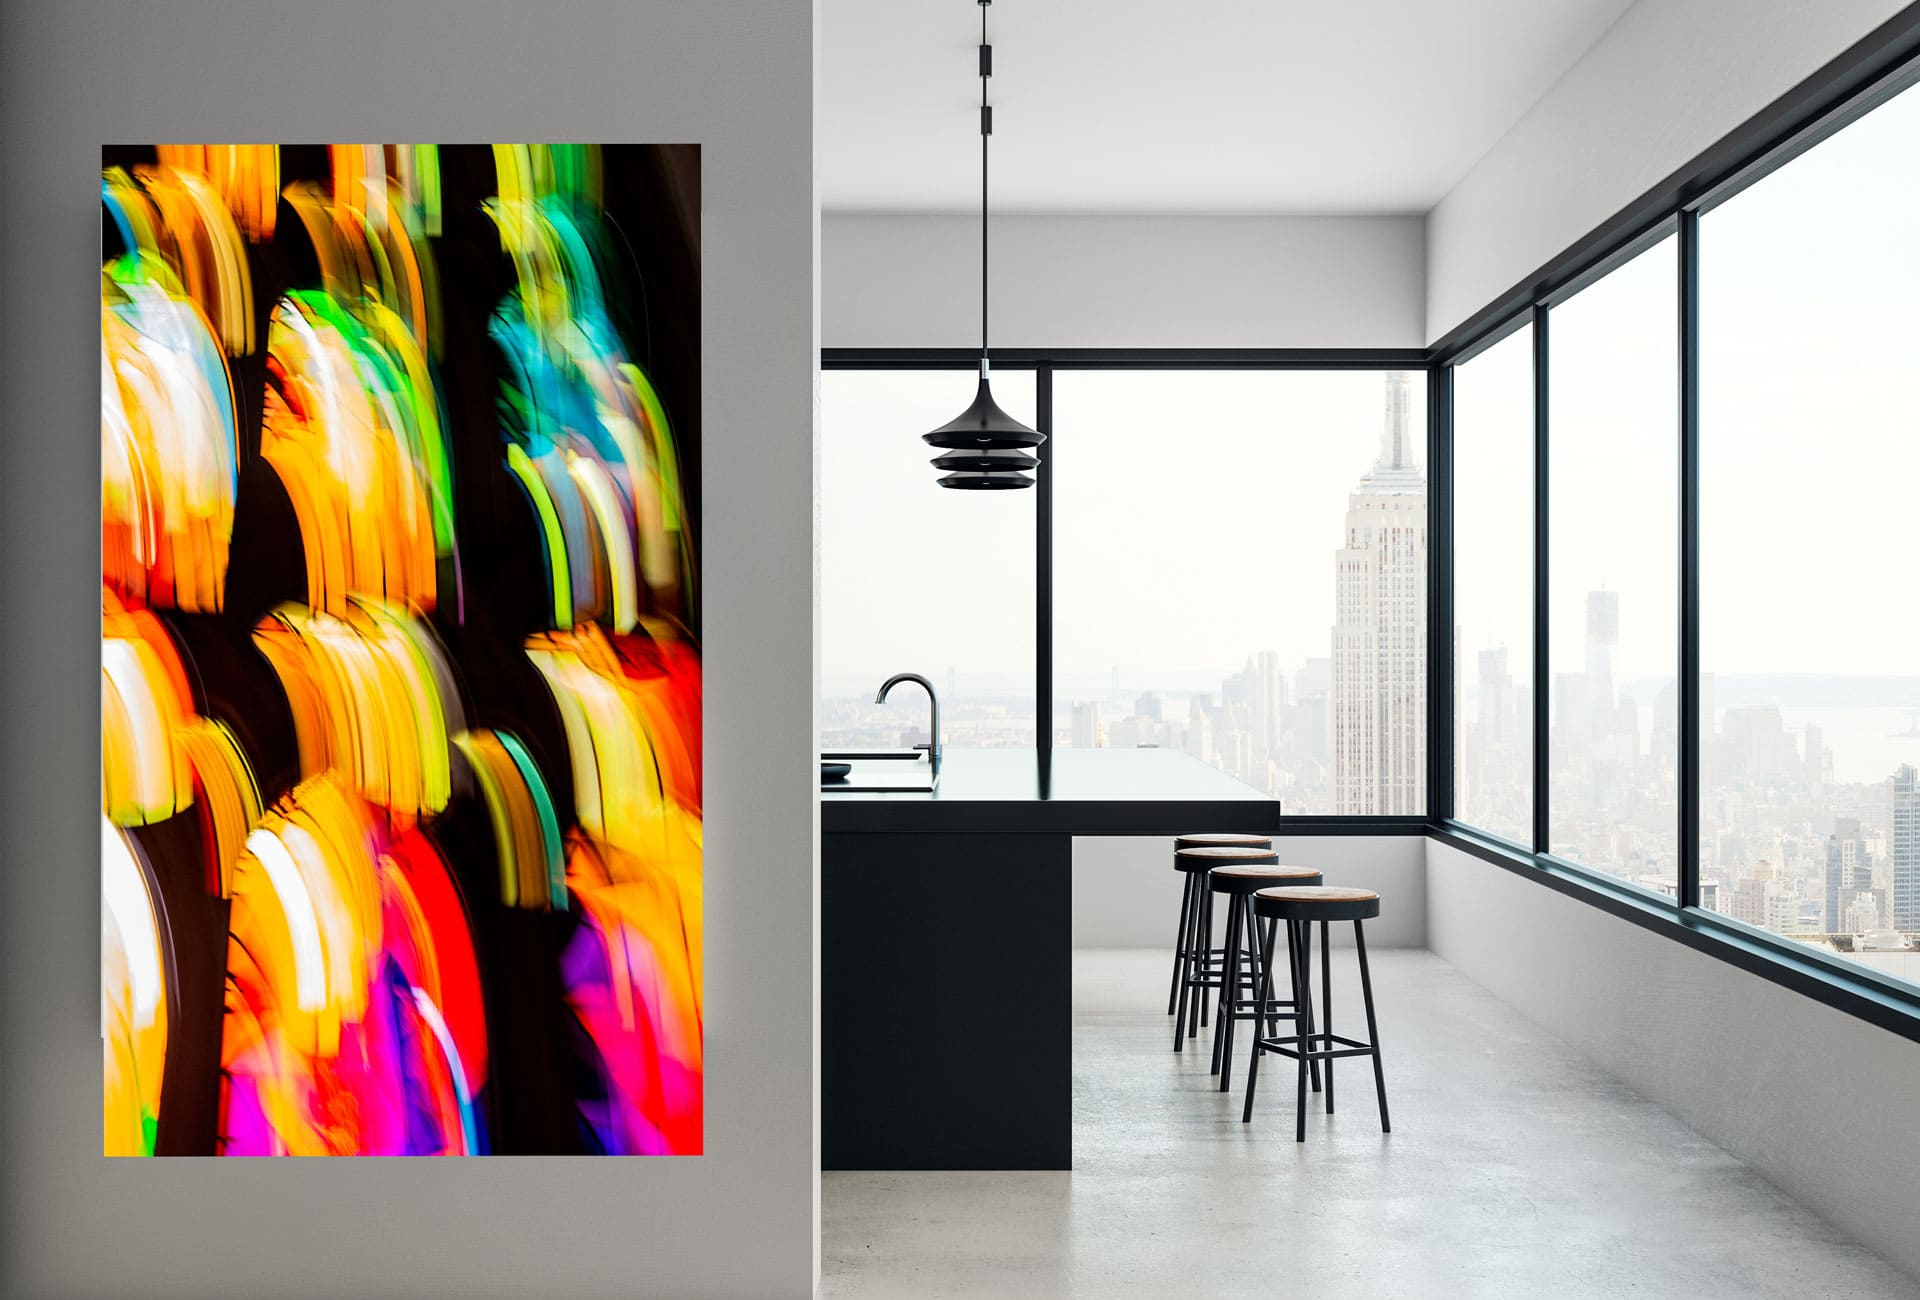 simoarts-com-simone-kessler-fotokunst-nuernberg-barcelona-sagrada-familia-Motiv05-1